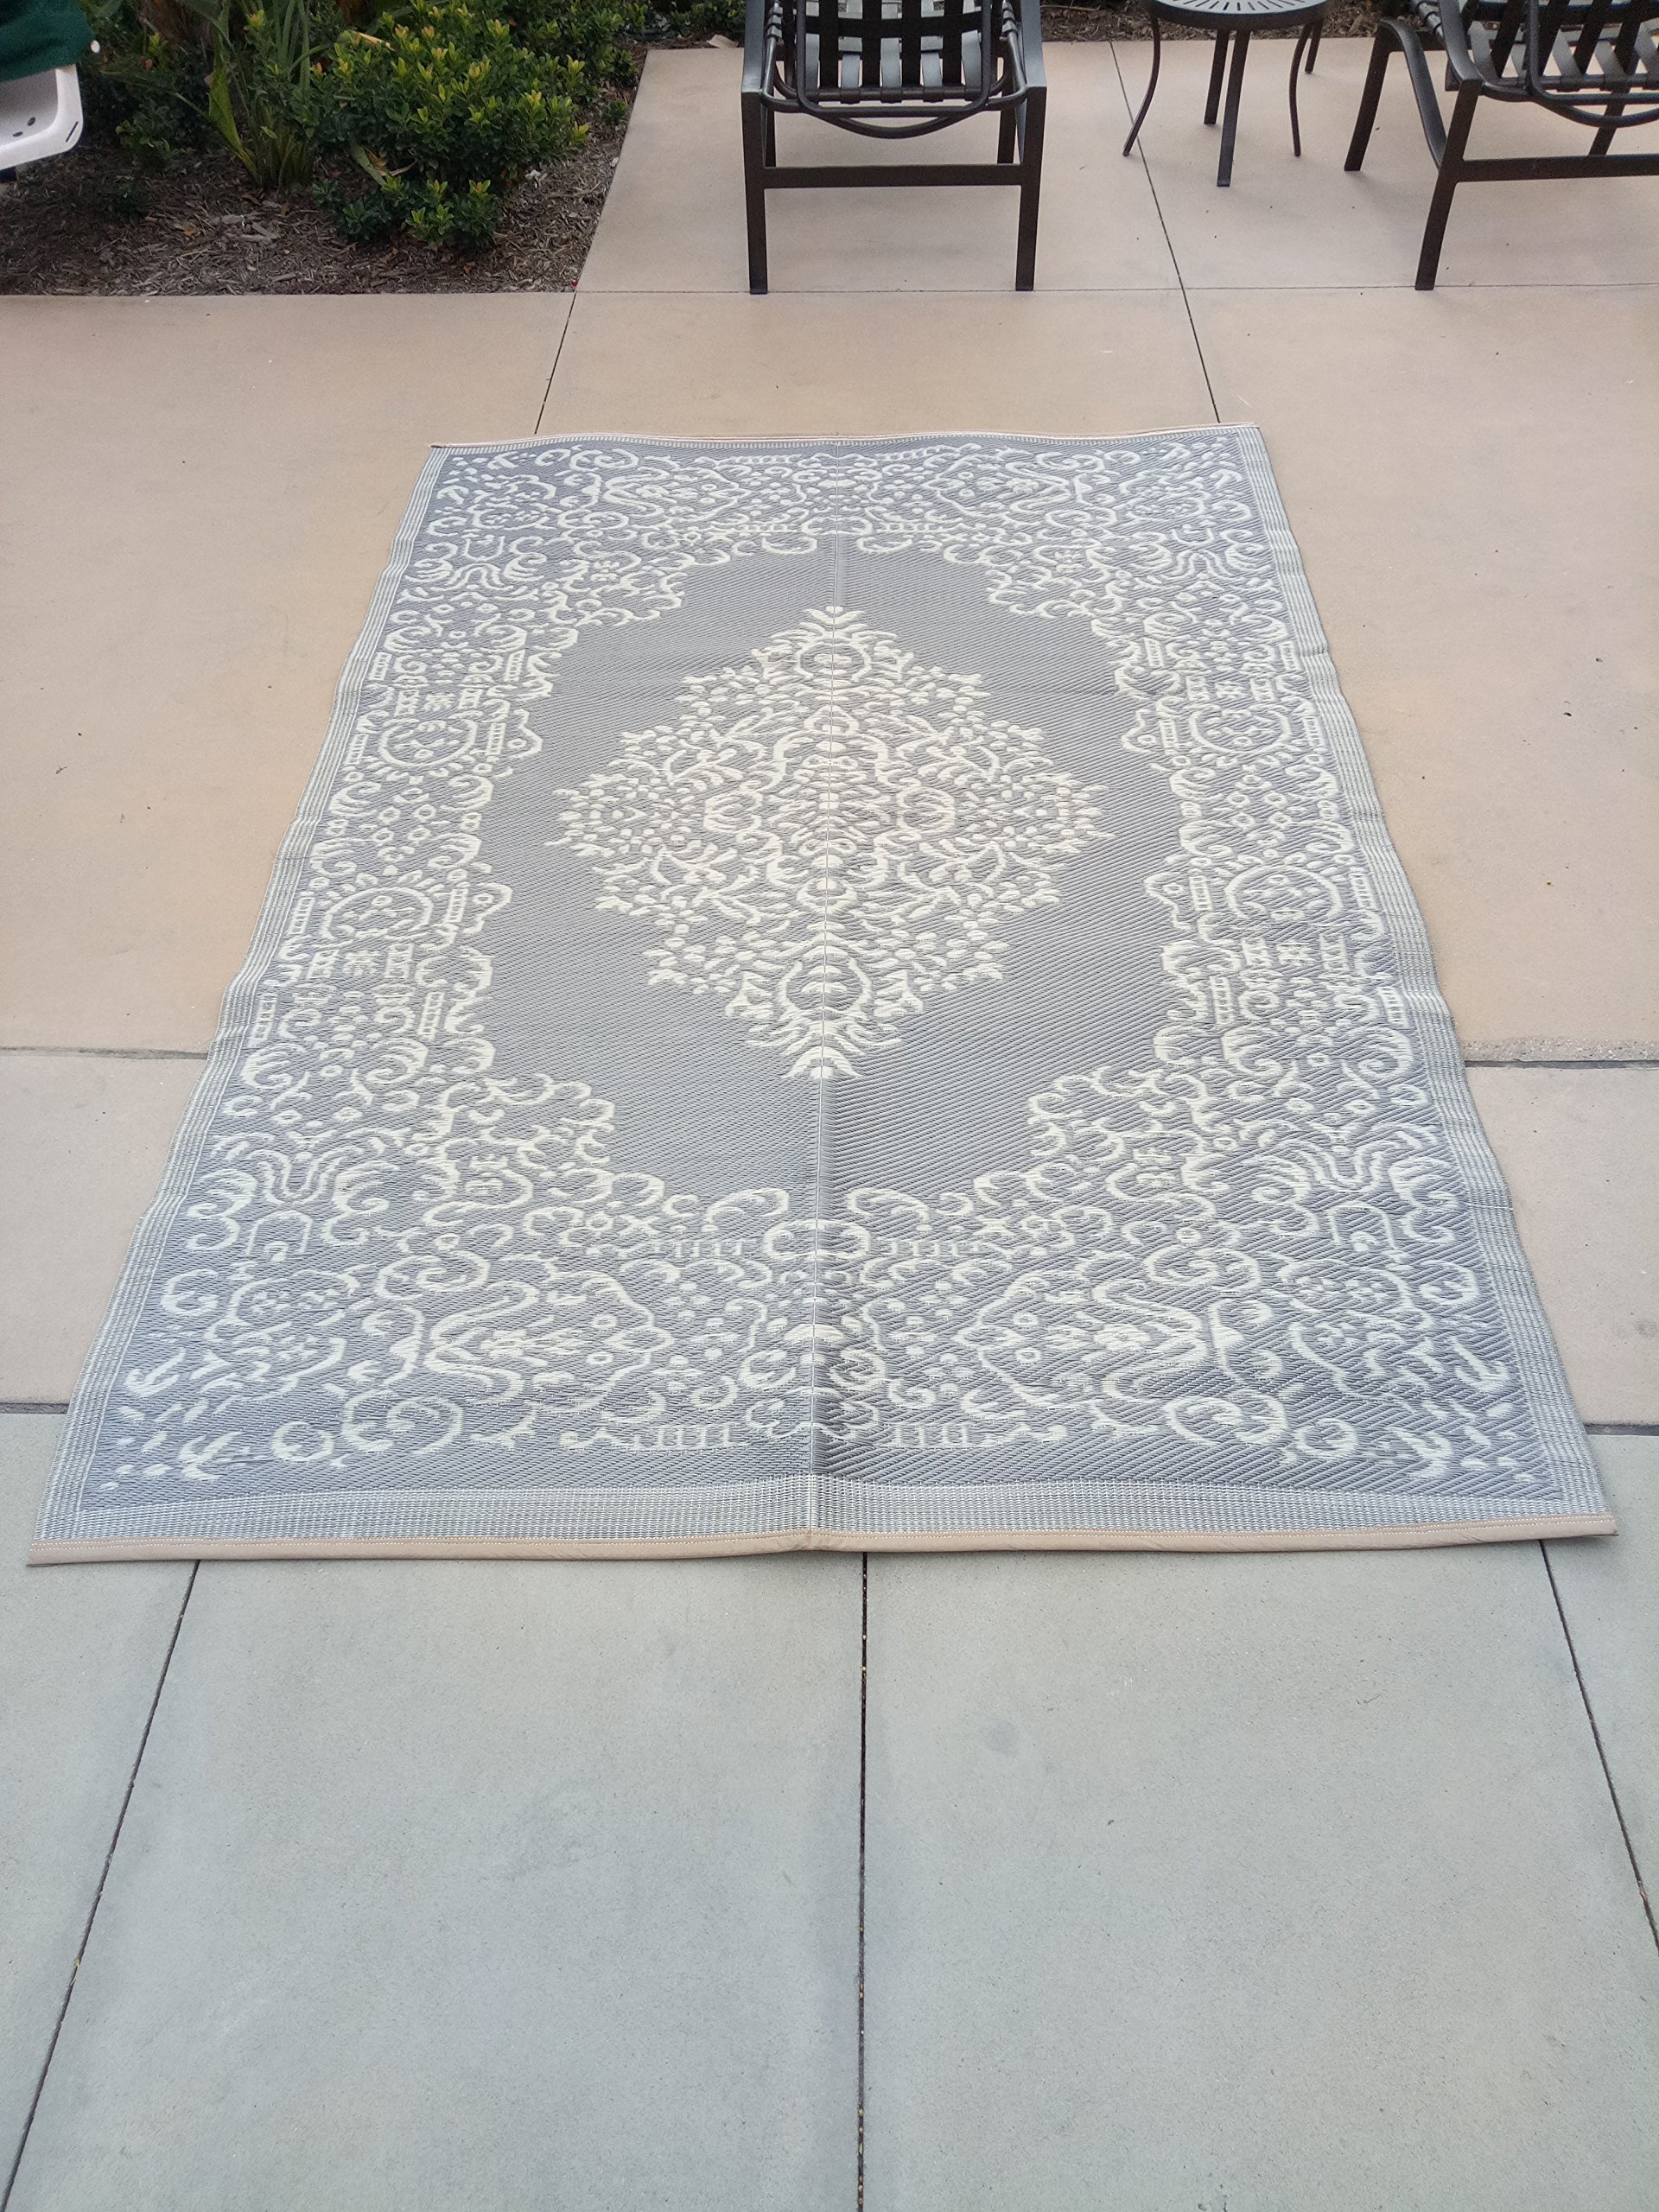 Lightweight Indoor Outdoor Reversible Plastic Area Rug - 5.9 x 8.9 Feet - Medallion Oriental Design - Grey/White by Beverly Rug